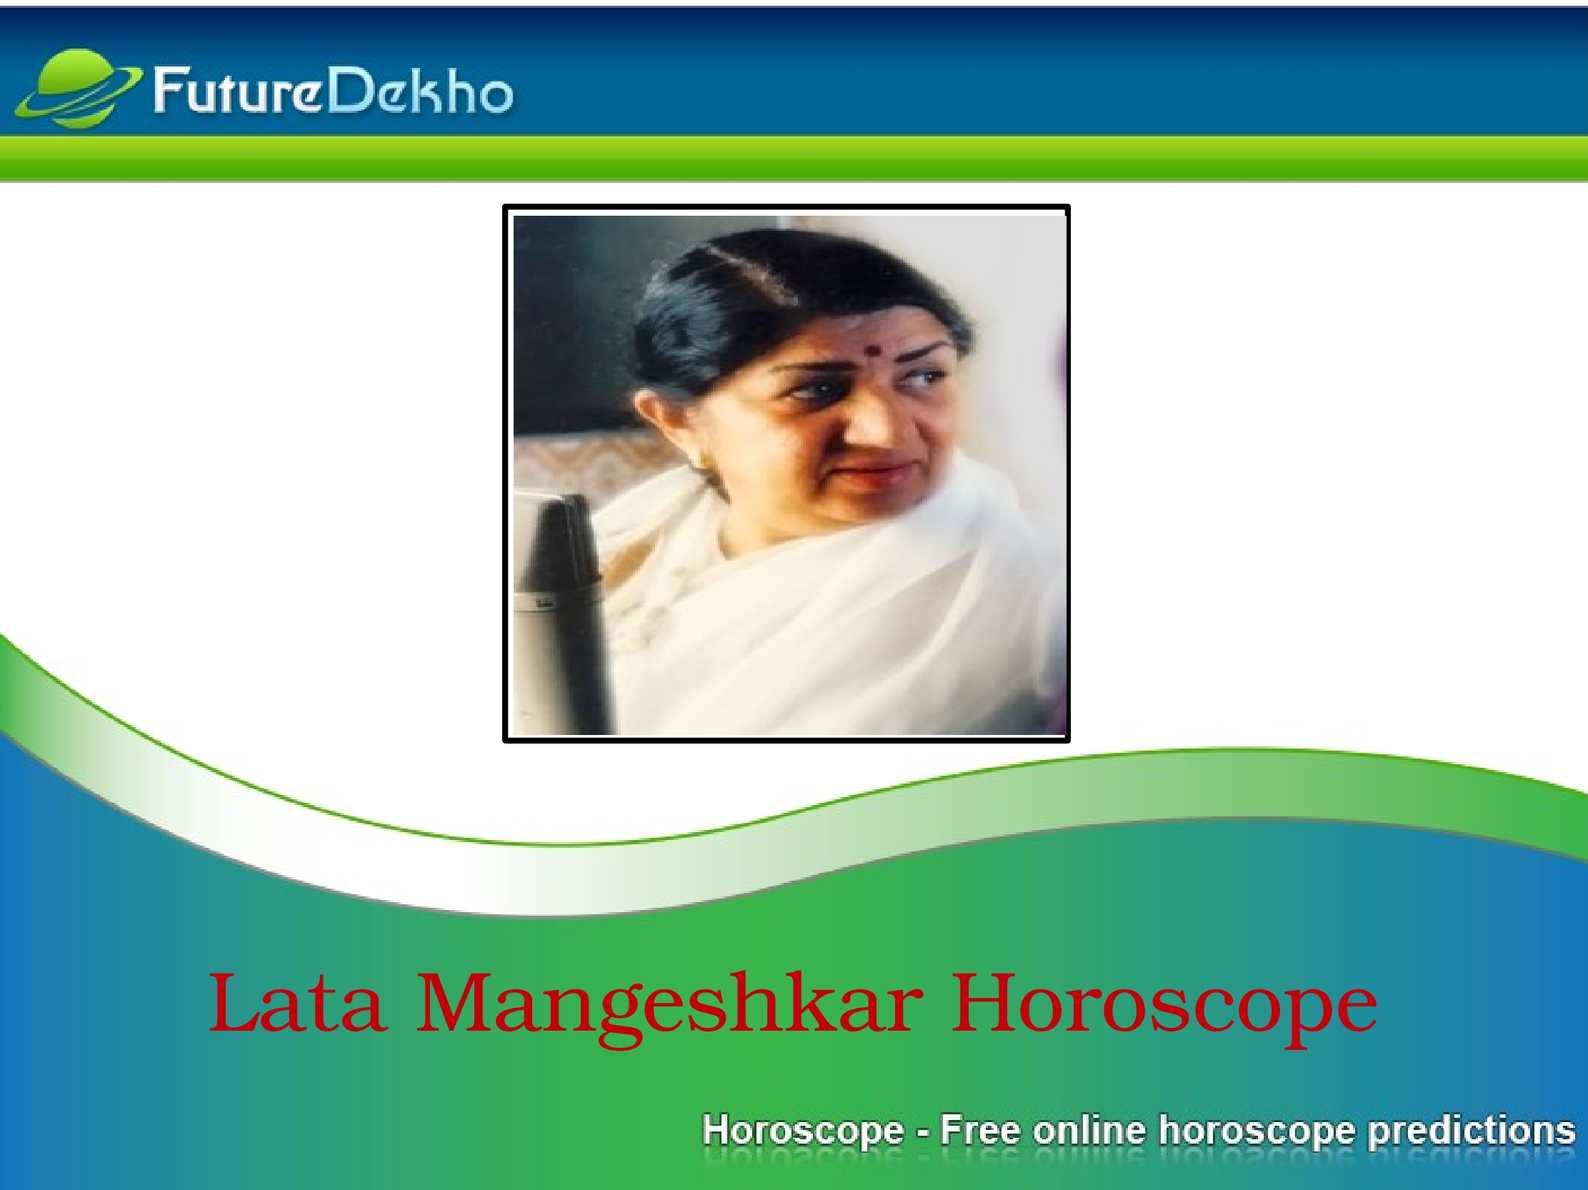 Calamo lata mangeshkar horoscope chart nvjuhfo Choice Image